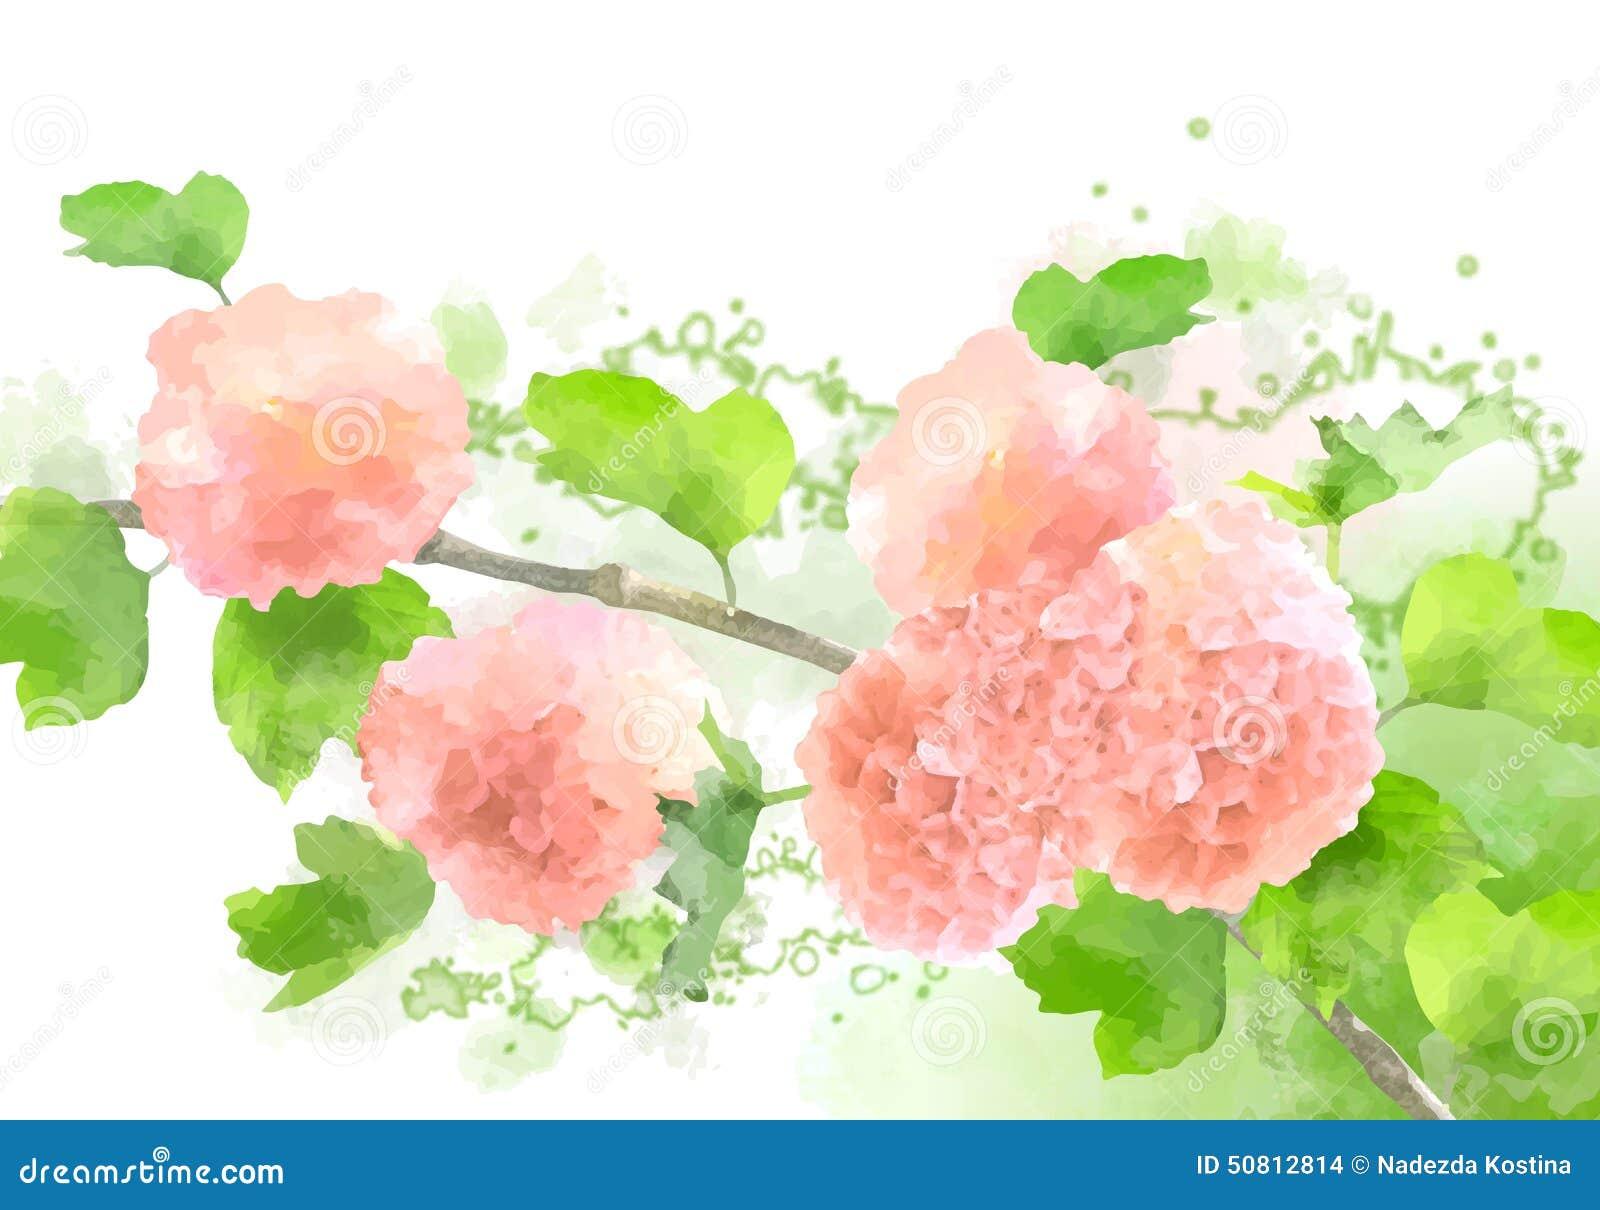 Vector Watercolor Flowers Hydrangea Stock Vector - Image ...